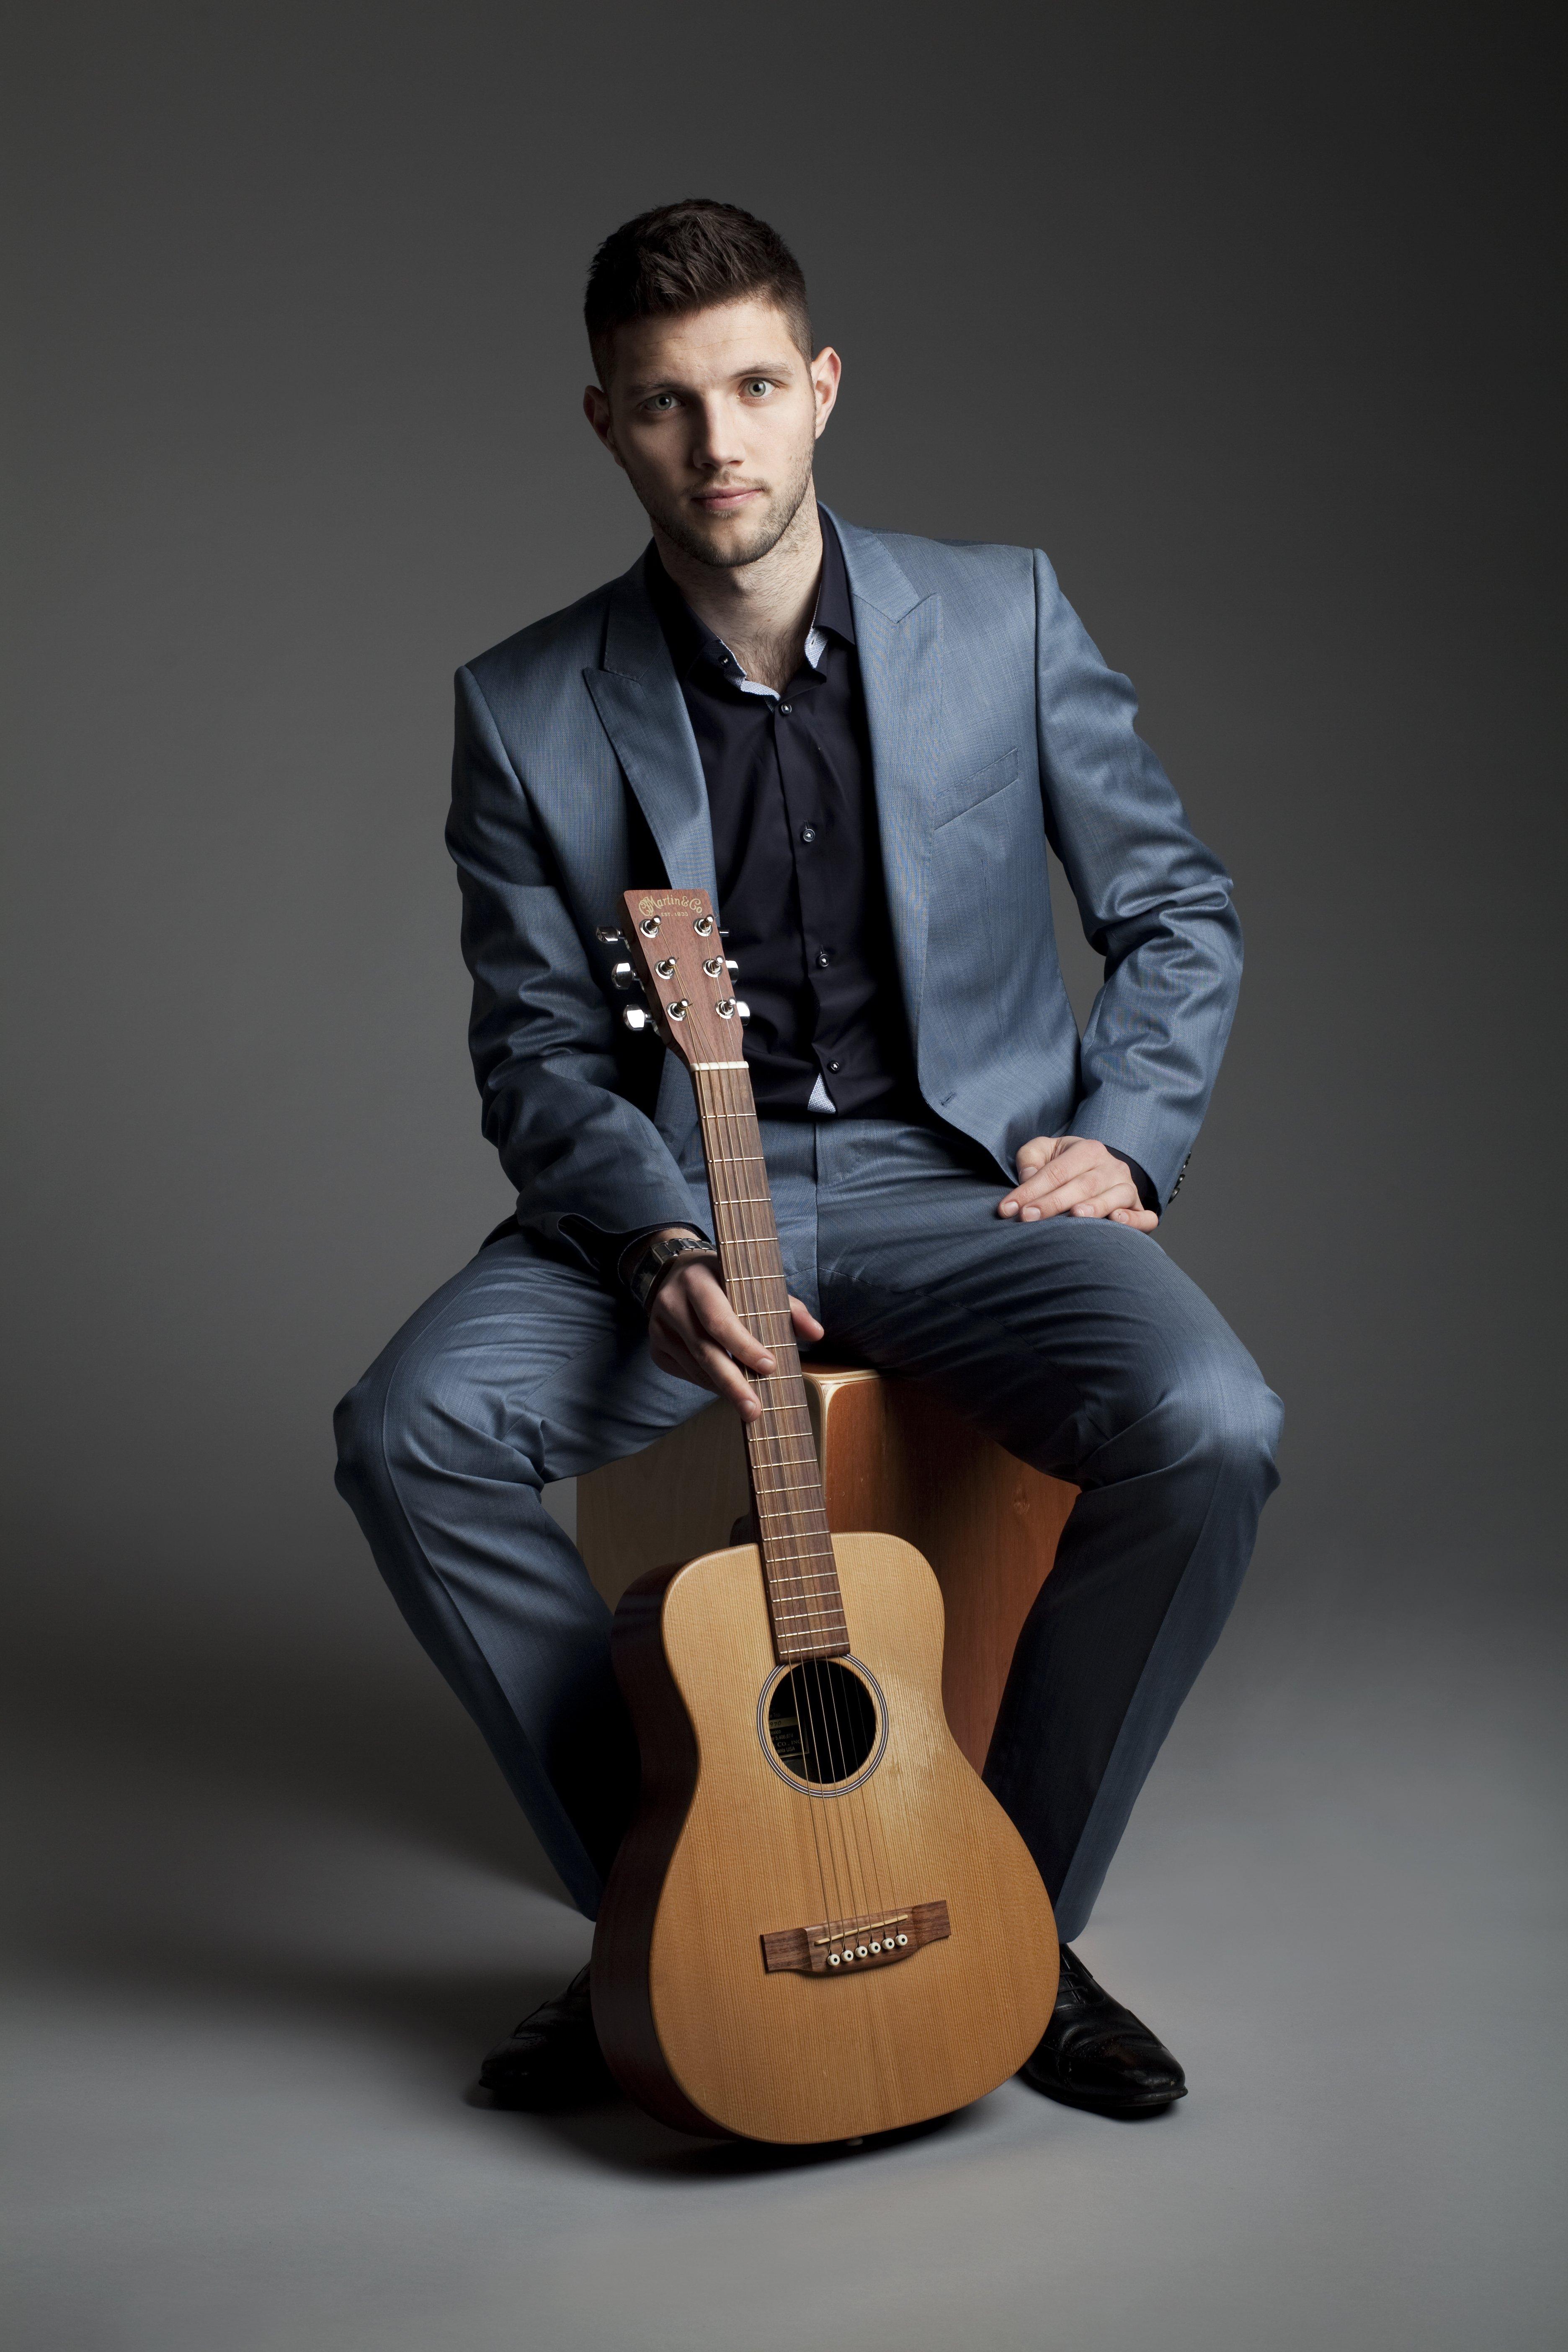 Colm Keegan – Baby Martin guitar